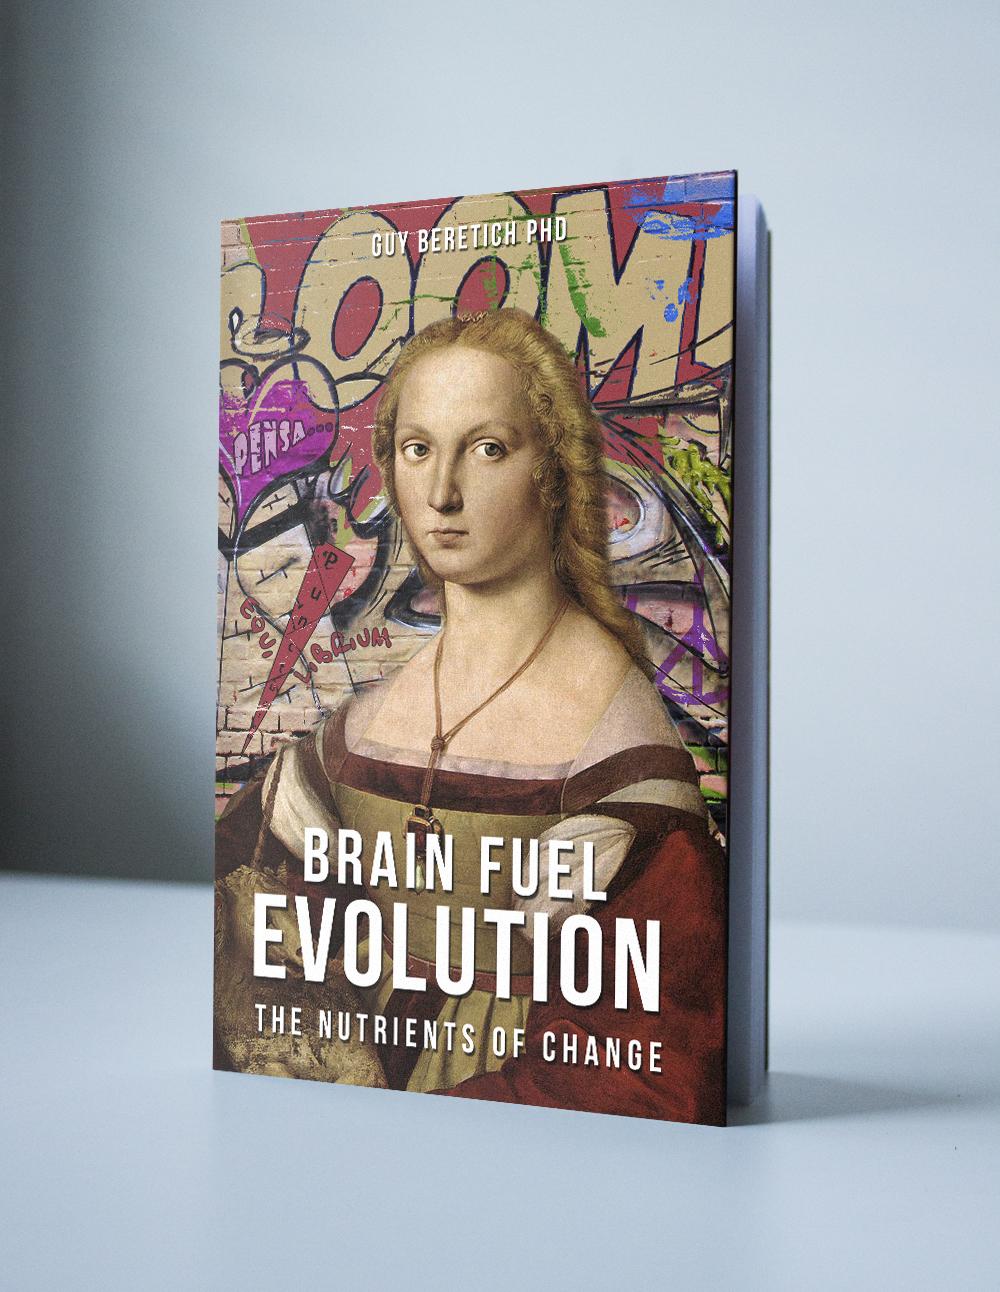 University Book Cover Design : Feminine upmarket university book cover design for a